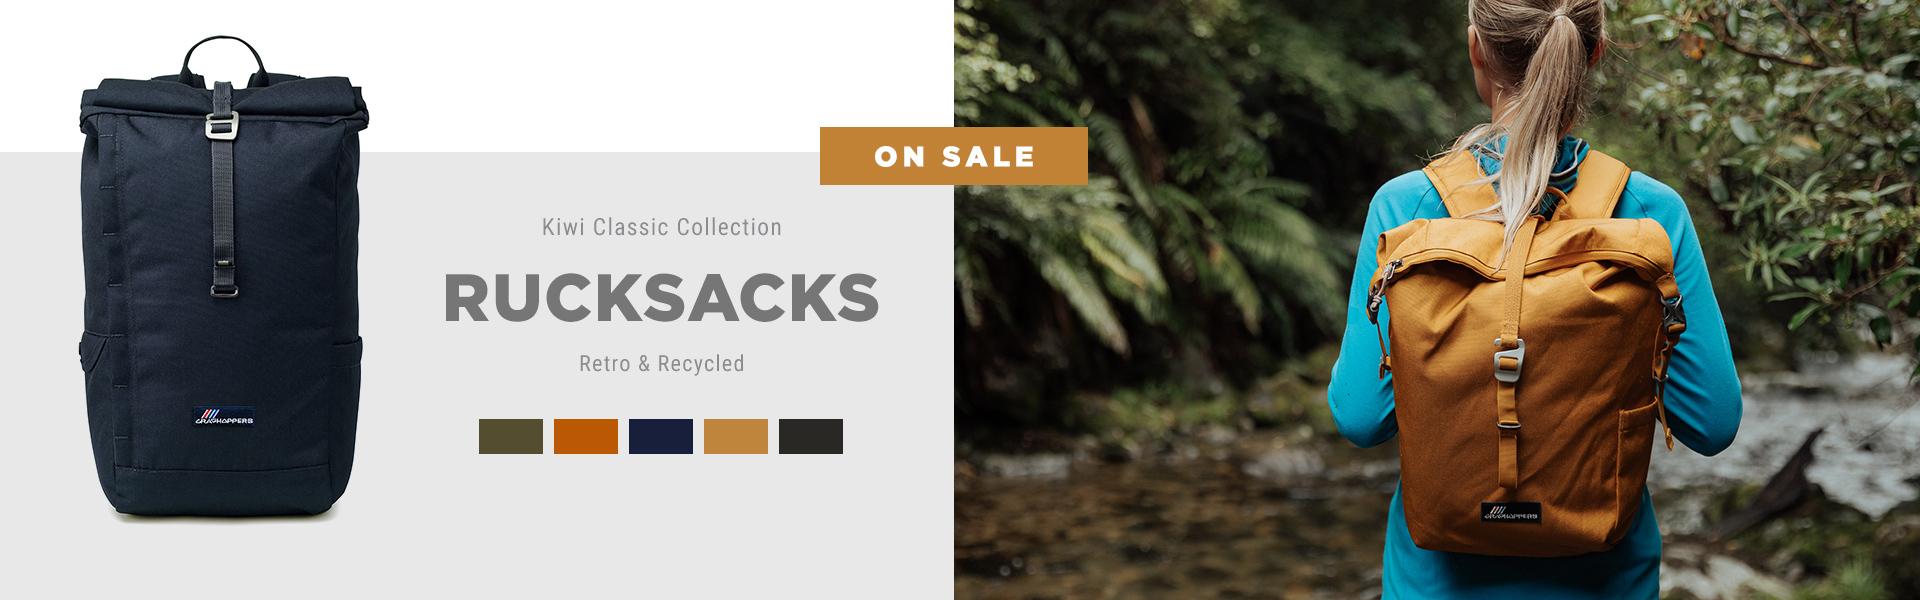 Kiwi Classic Collection Rucksacks